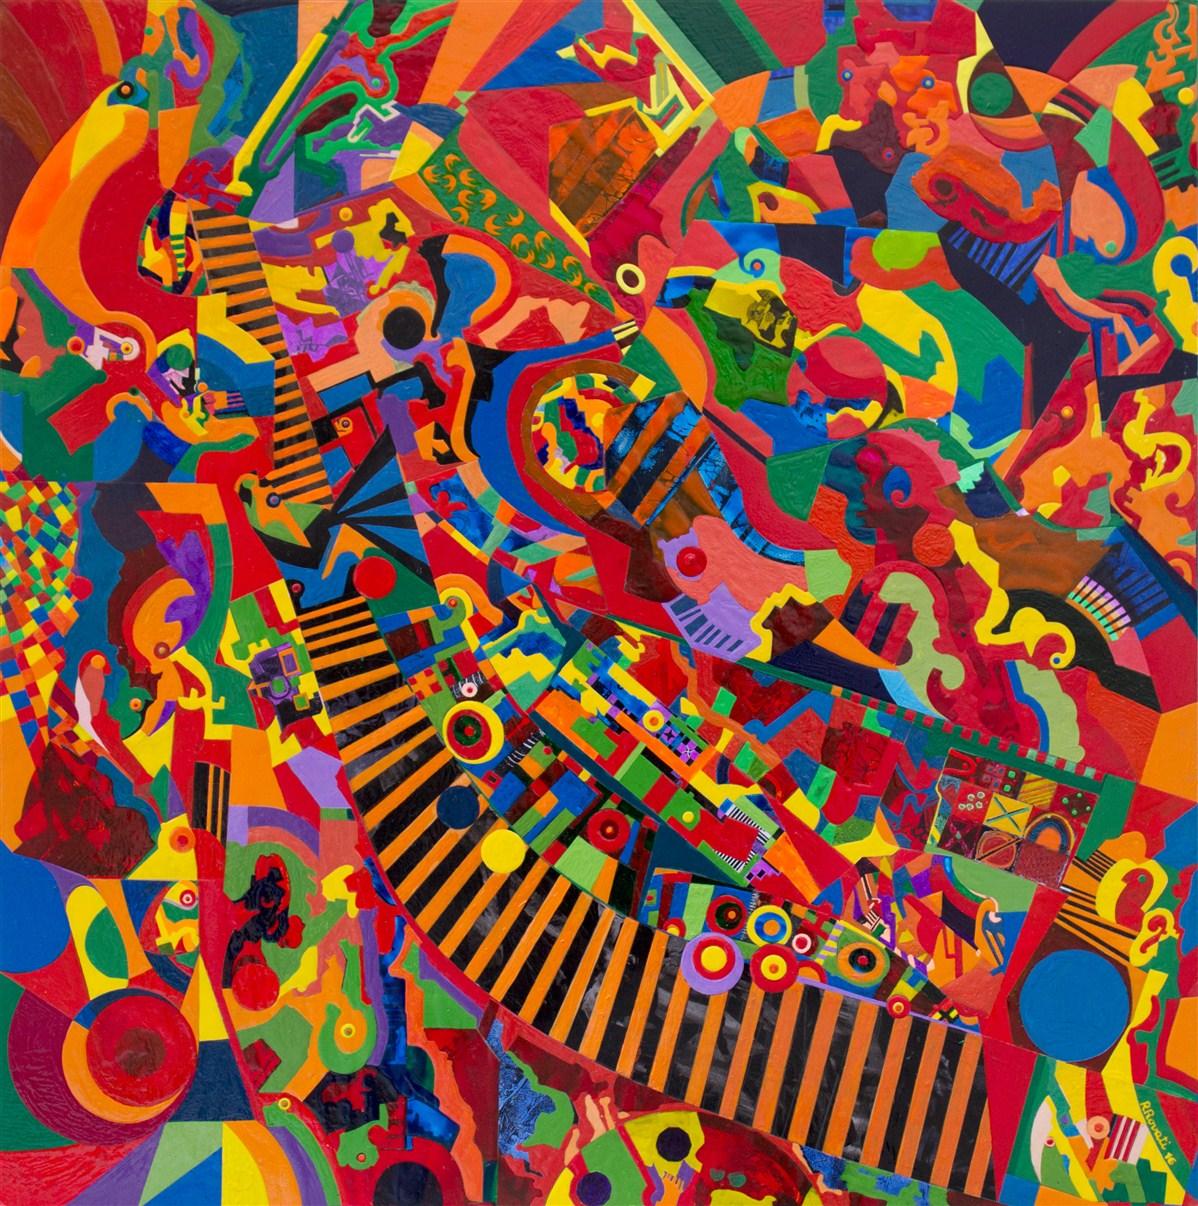 2016-senzatitolo-tecnica-mista-su-tavola-2016-90x90cm.jpg